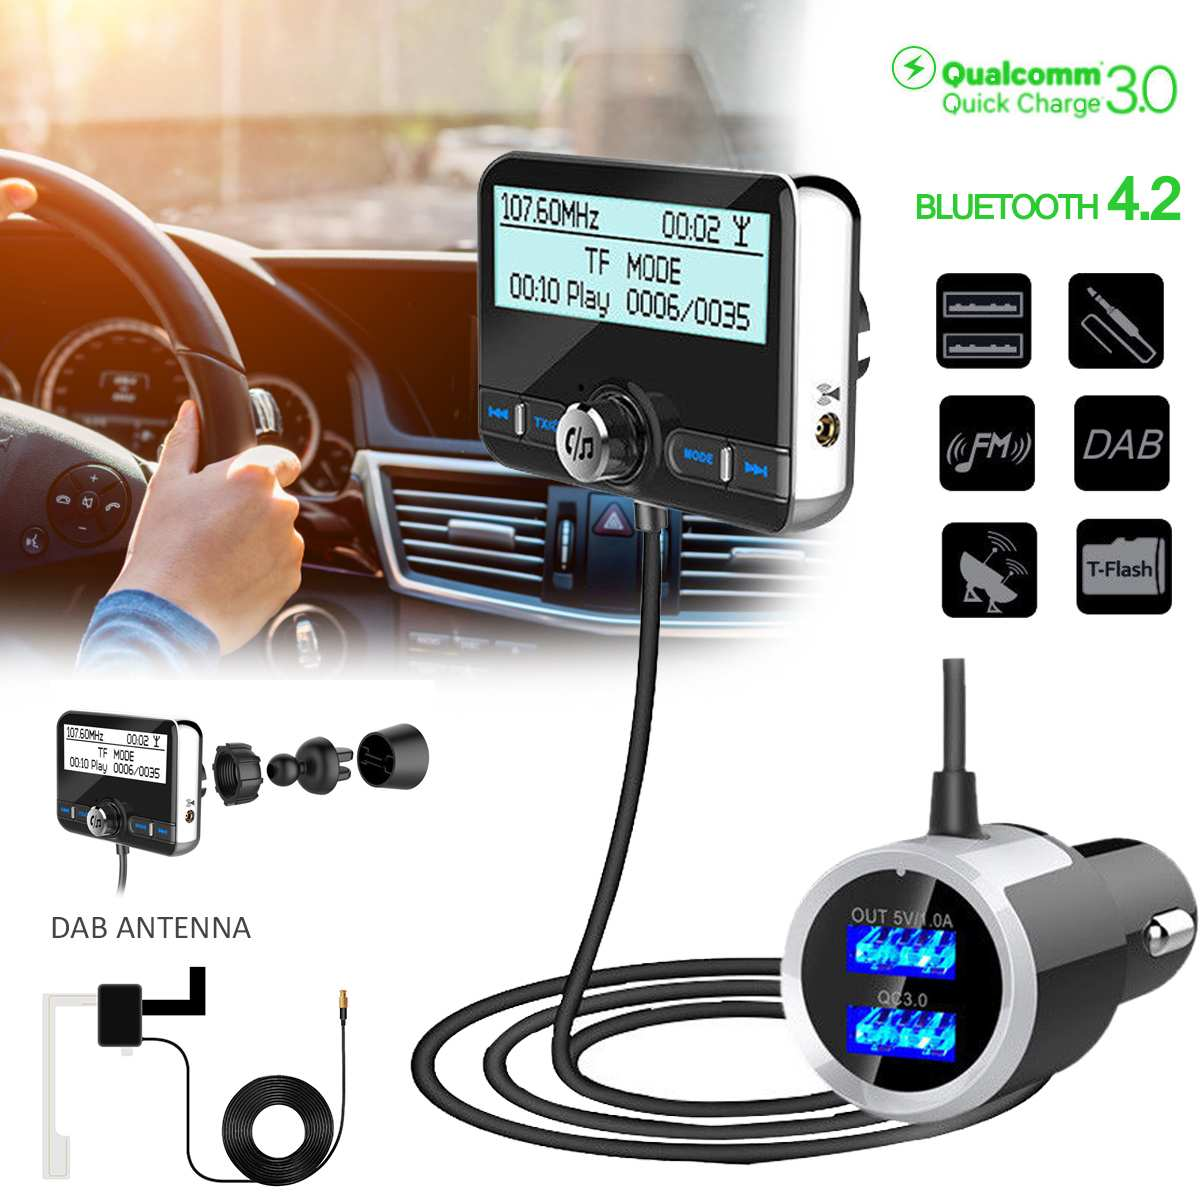 DAB/DAB радио + цифровое радио тюнер USB адаптер Bluetooth fm-передатчик TF/AUX/MP3 антенны ЖК-дисплей громкой связи вызов